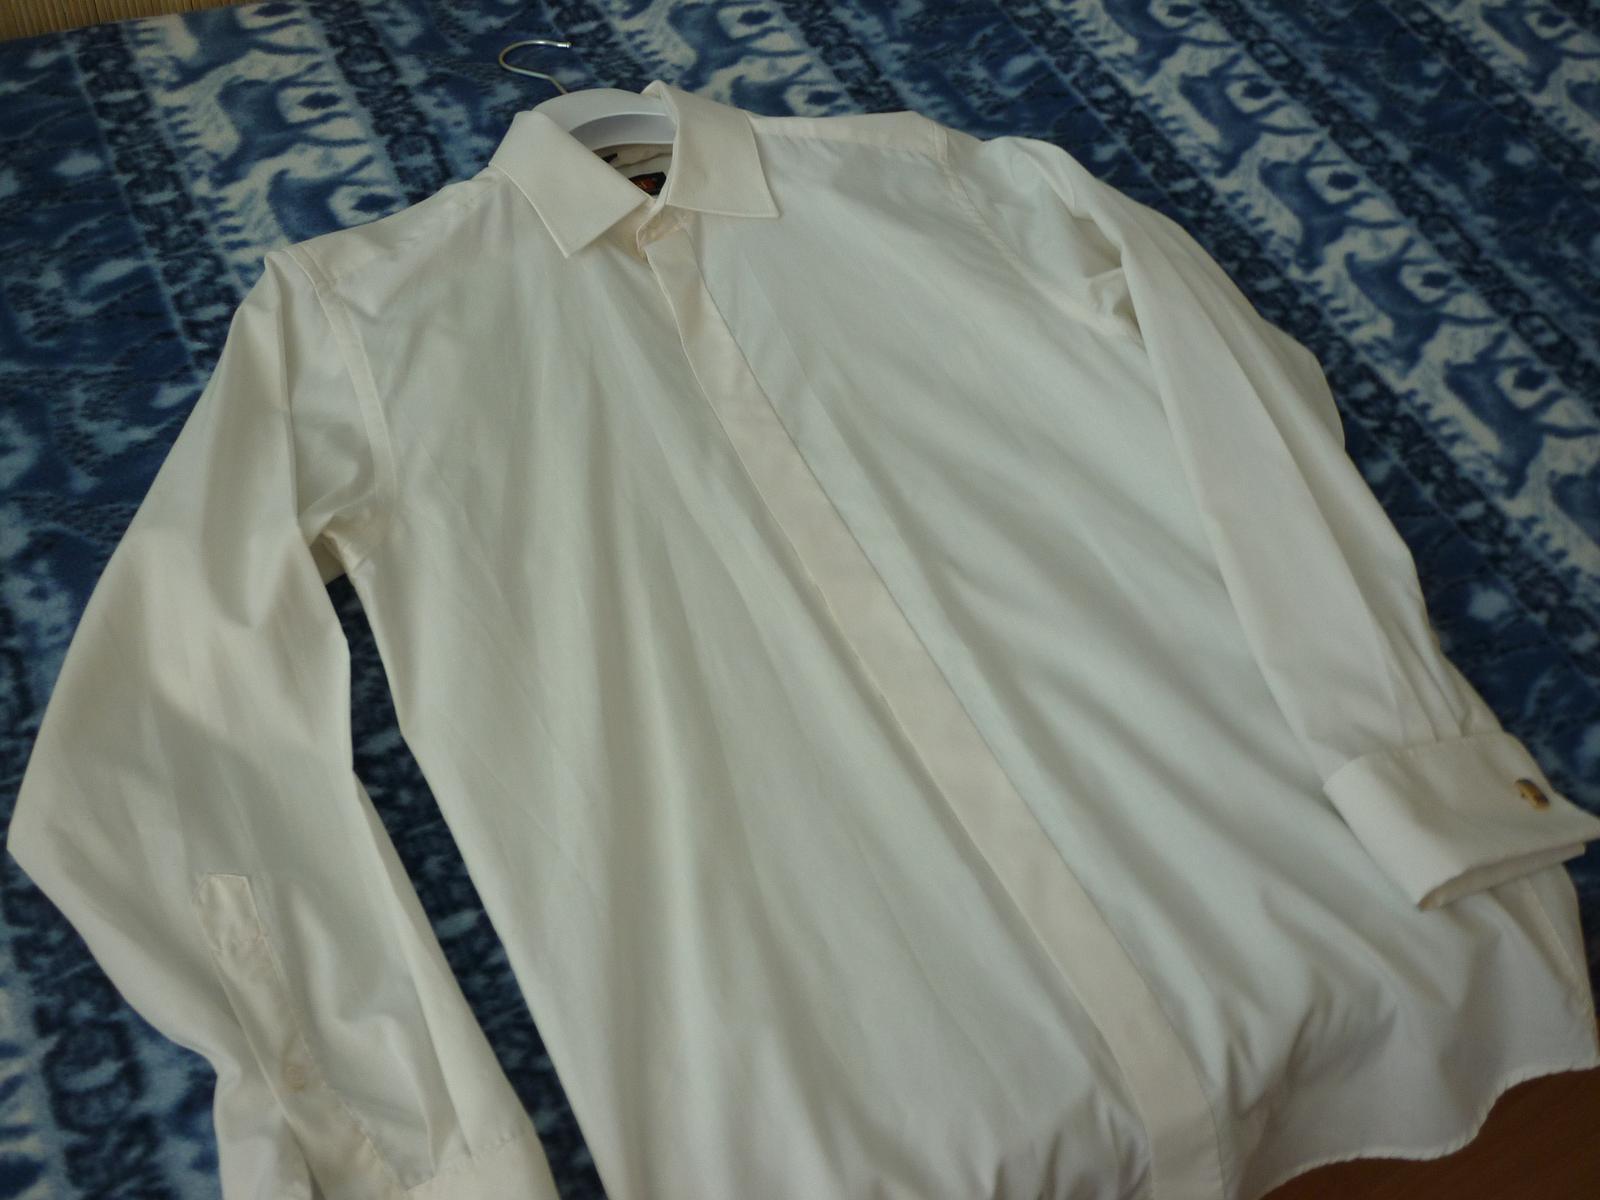 bde13589371a Svadobná maslová košeľa